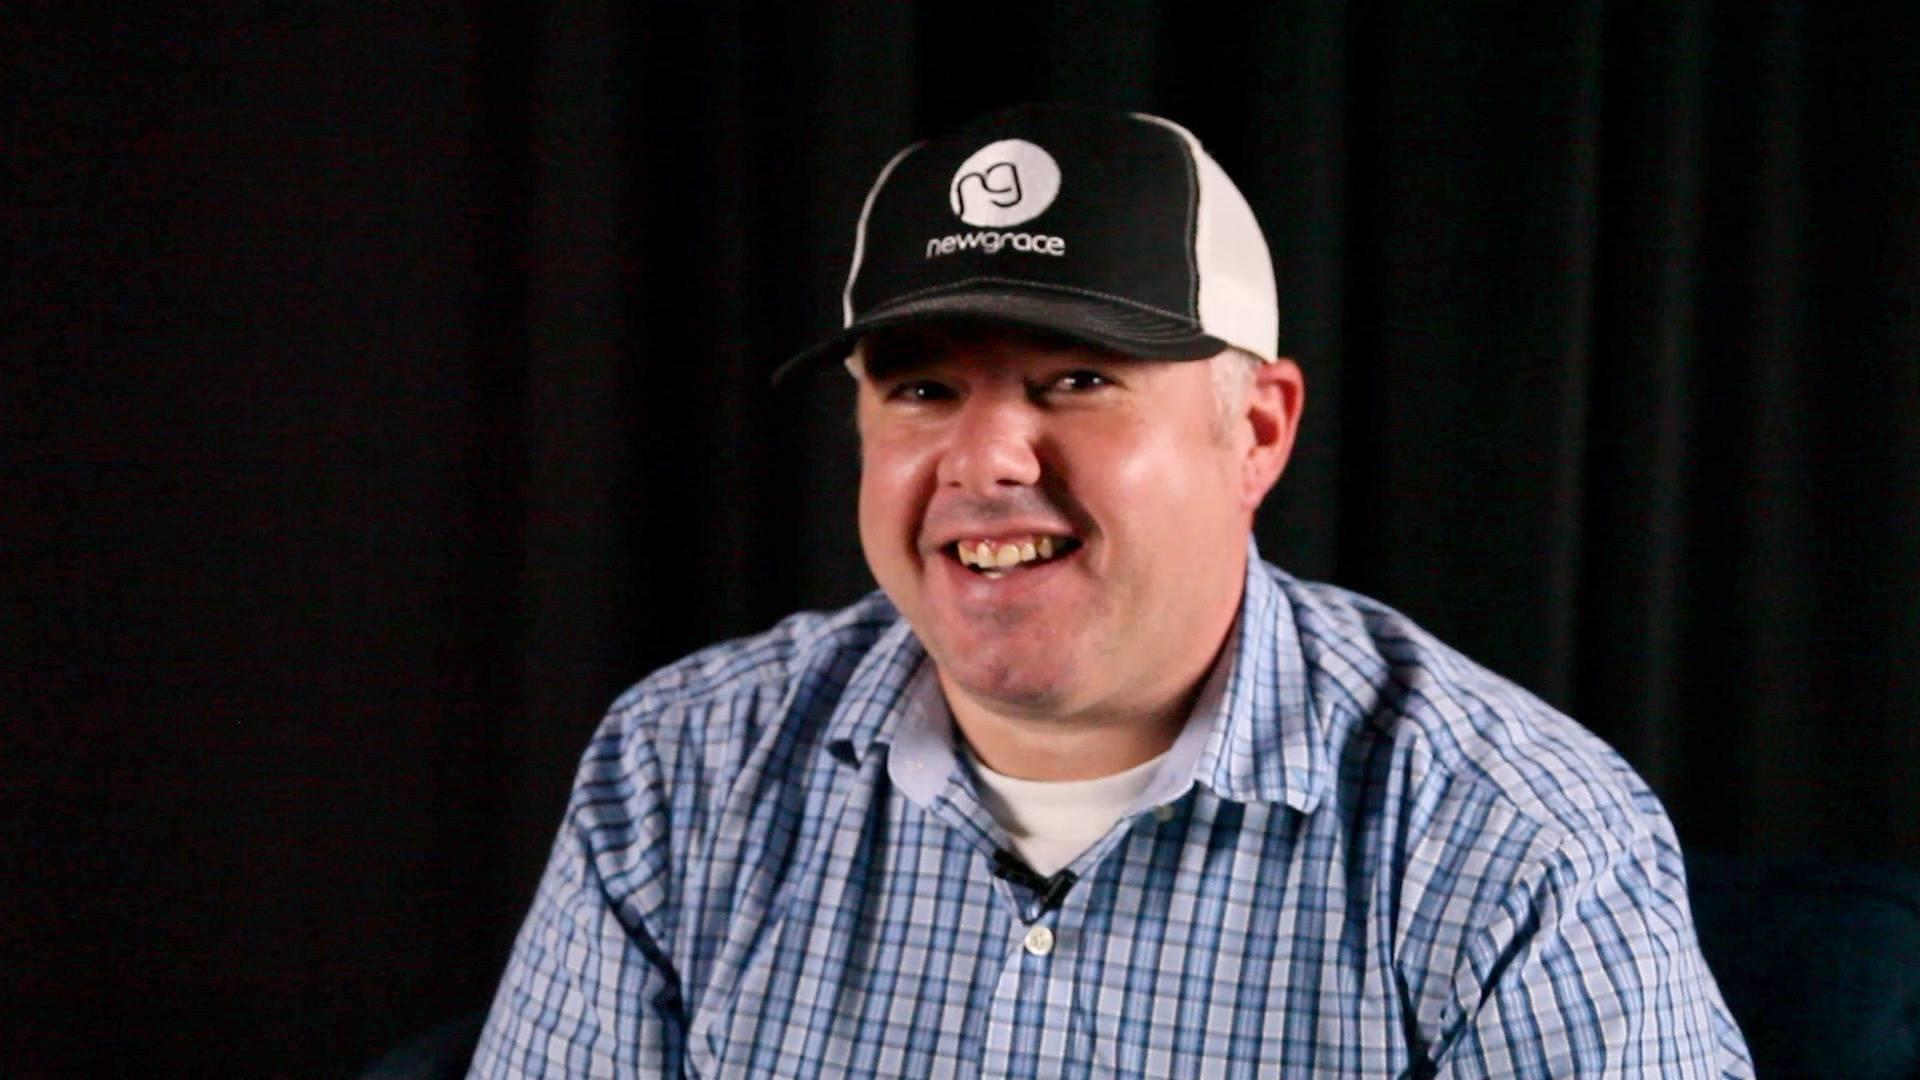 Losing My Religion: Josh's Story